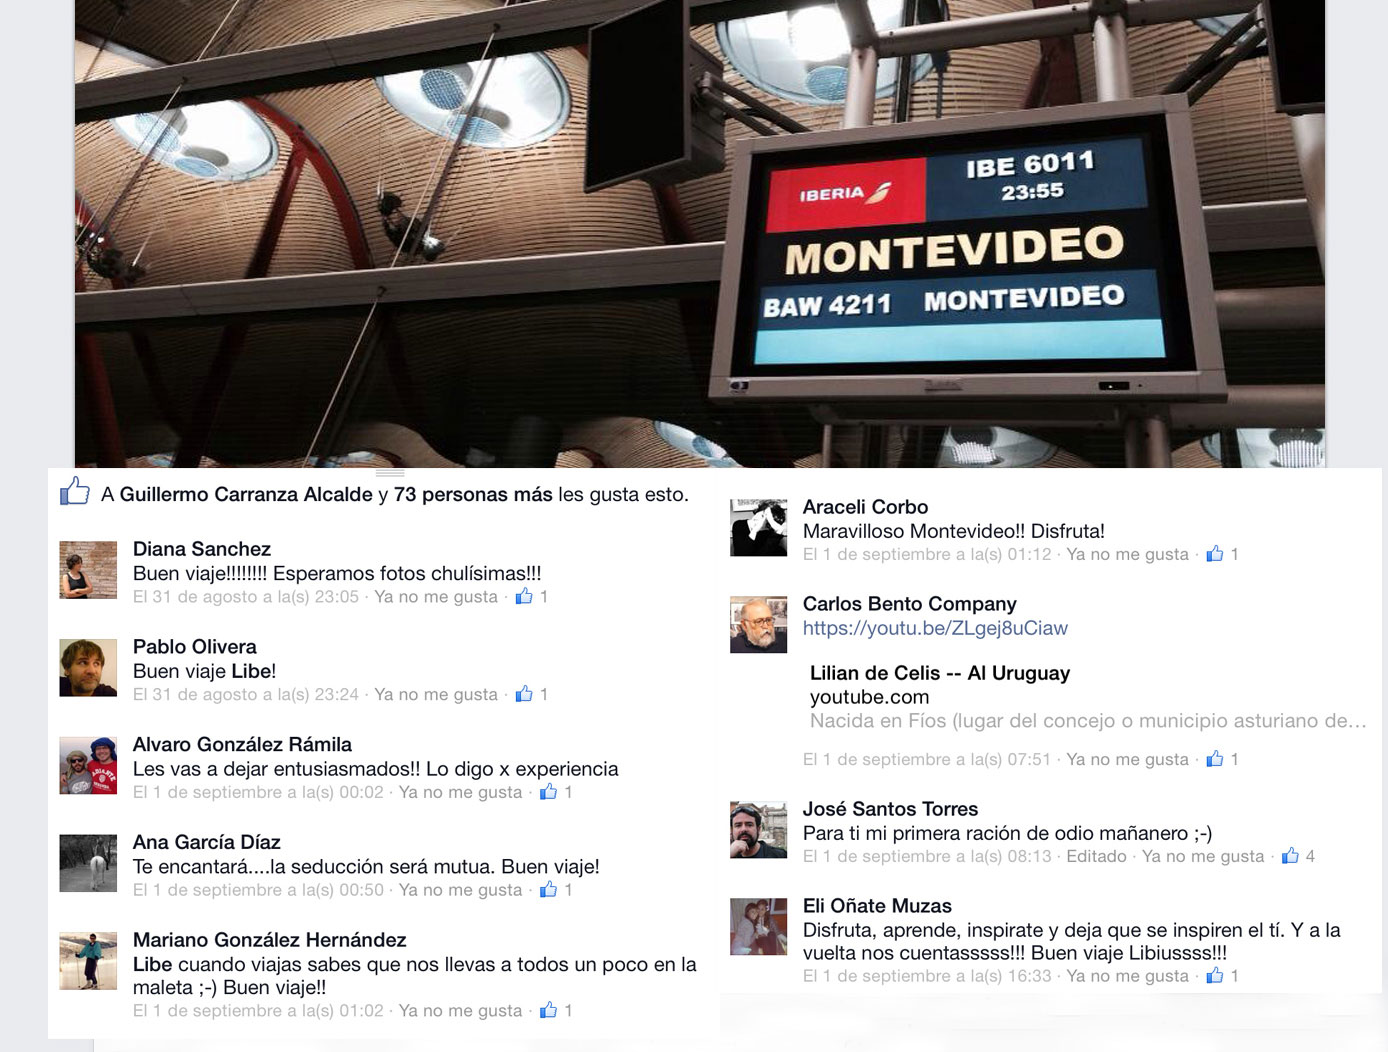 reharq_viaje-empresarial-montevideo_facebook_patrimonio